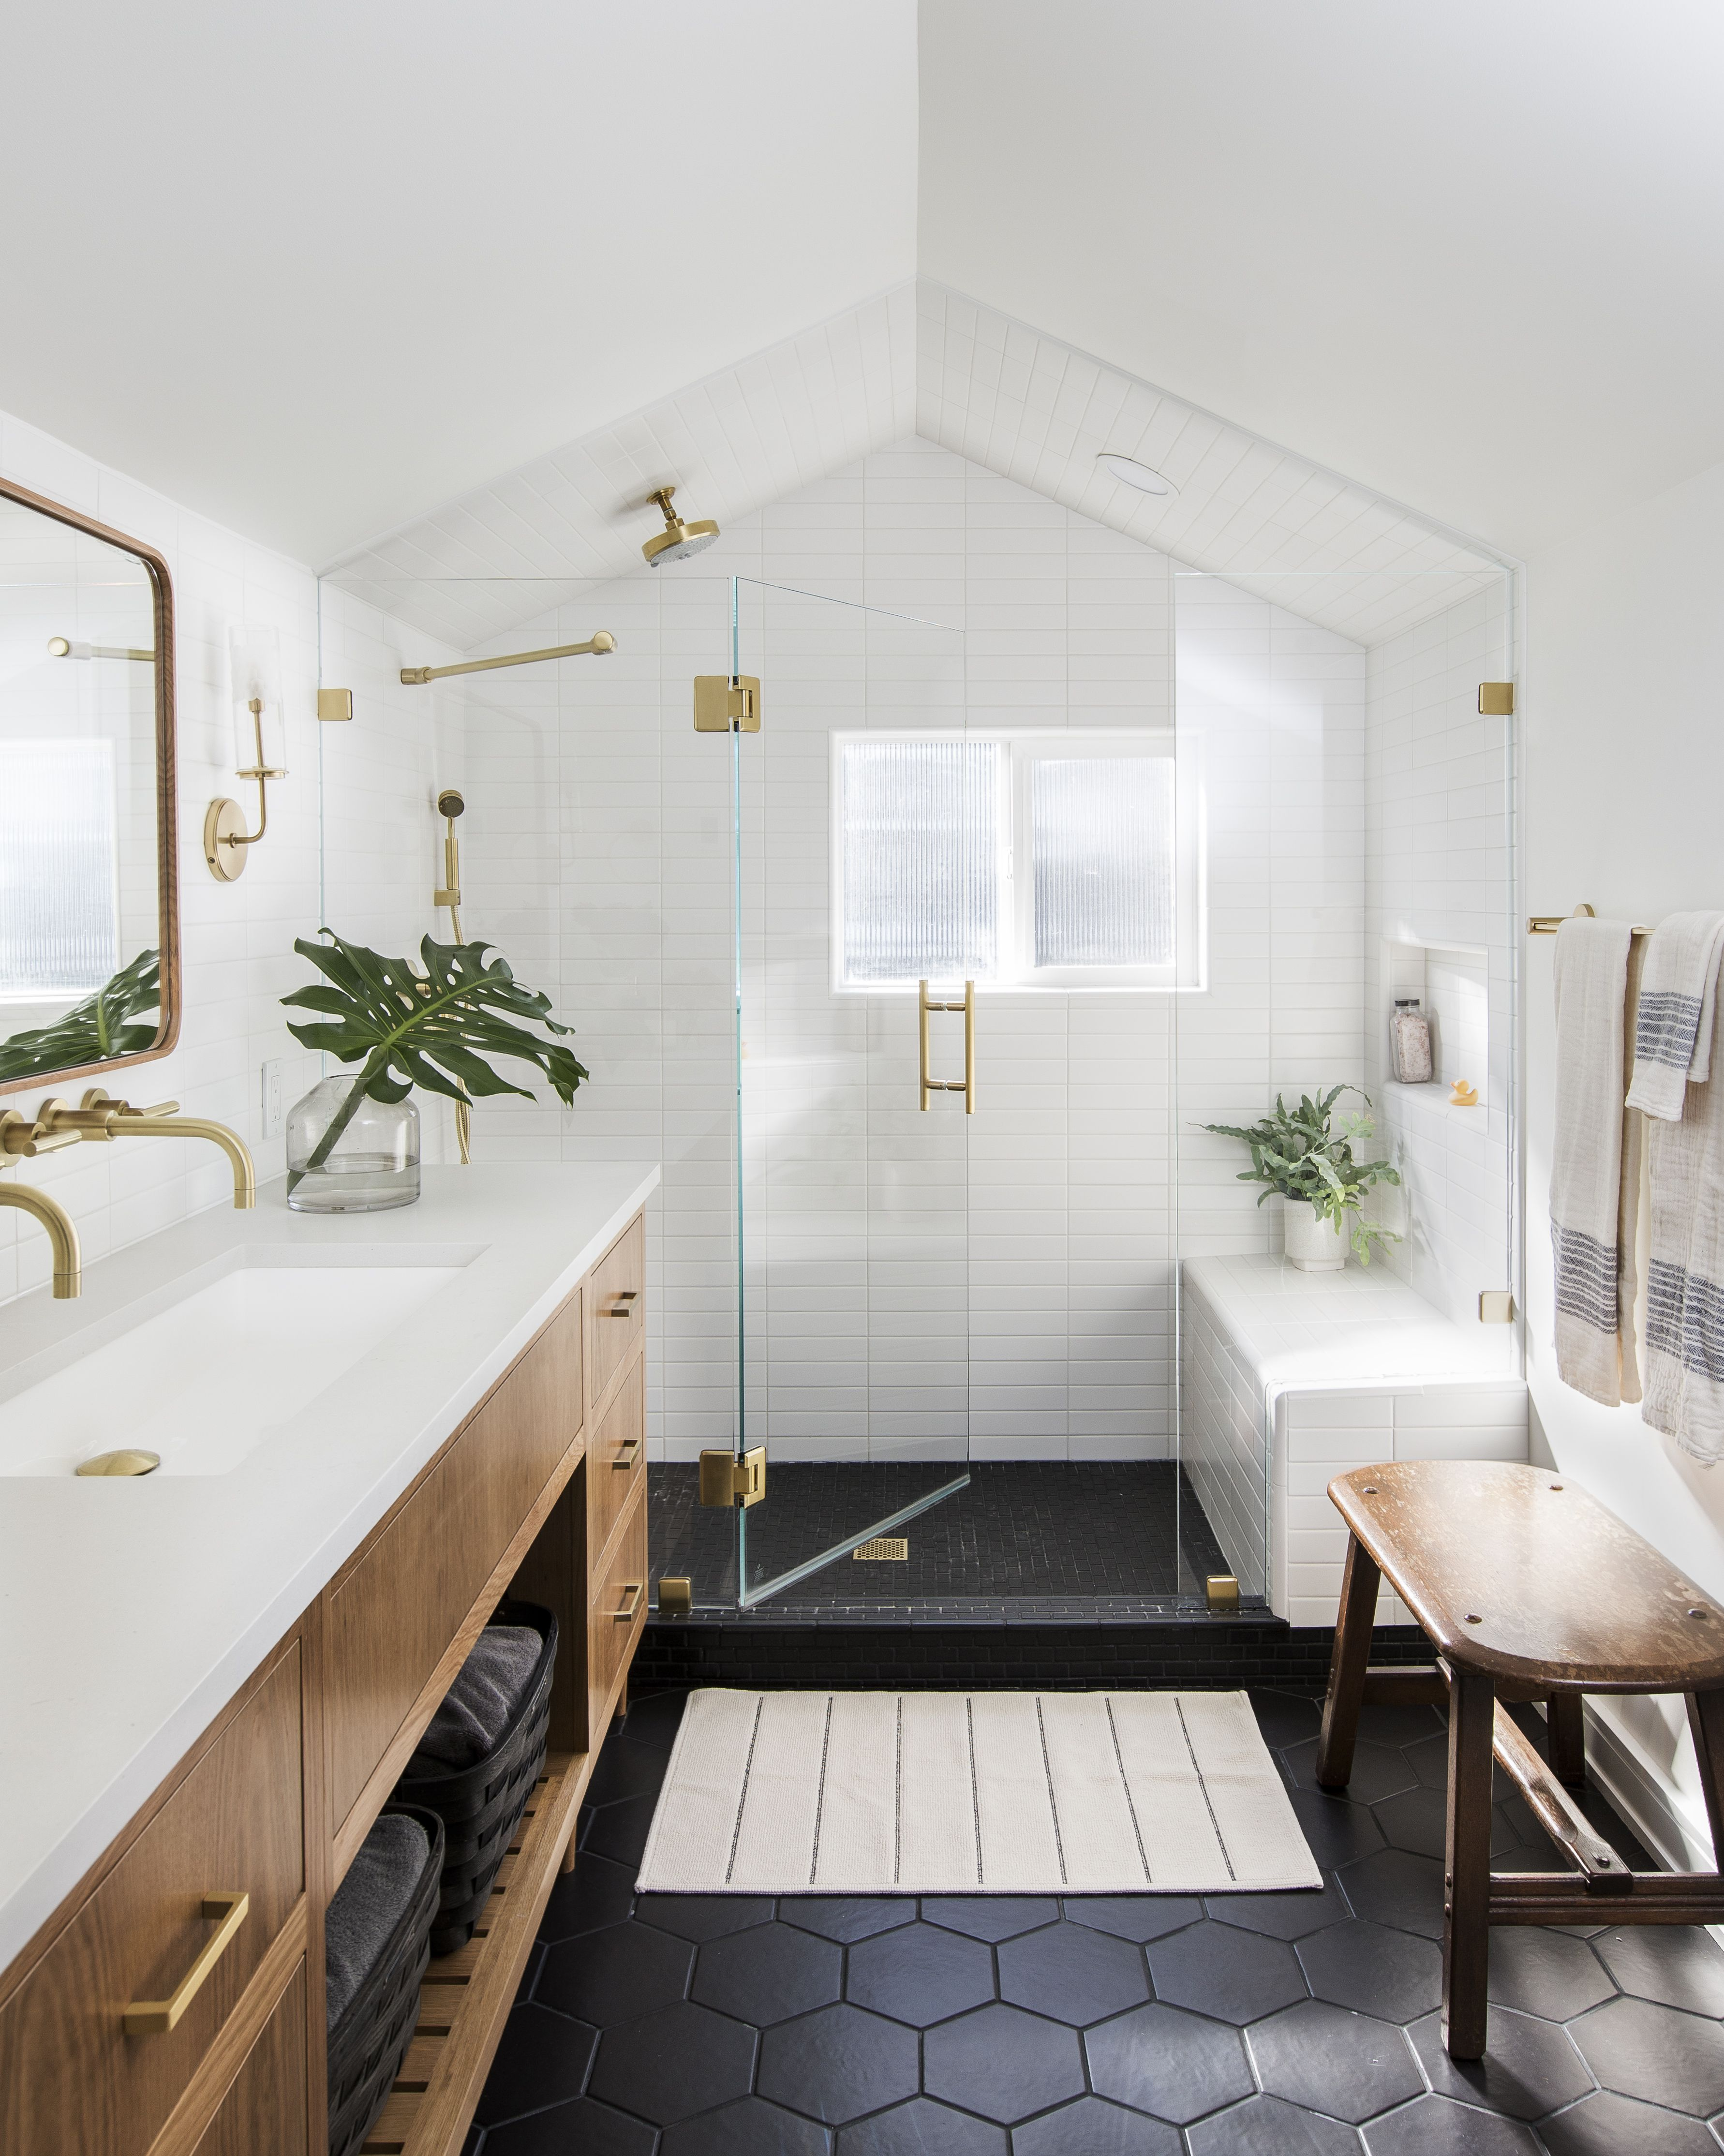 Hudson Valley Lighting Wentworth Wall Sconce Bathroom Interior Beautiful Bathrooms Bathrooms Remodel